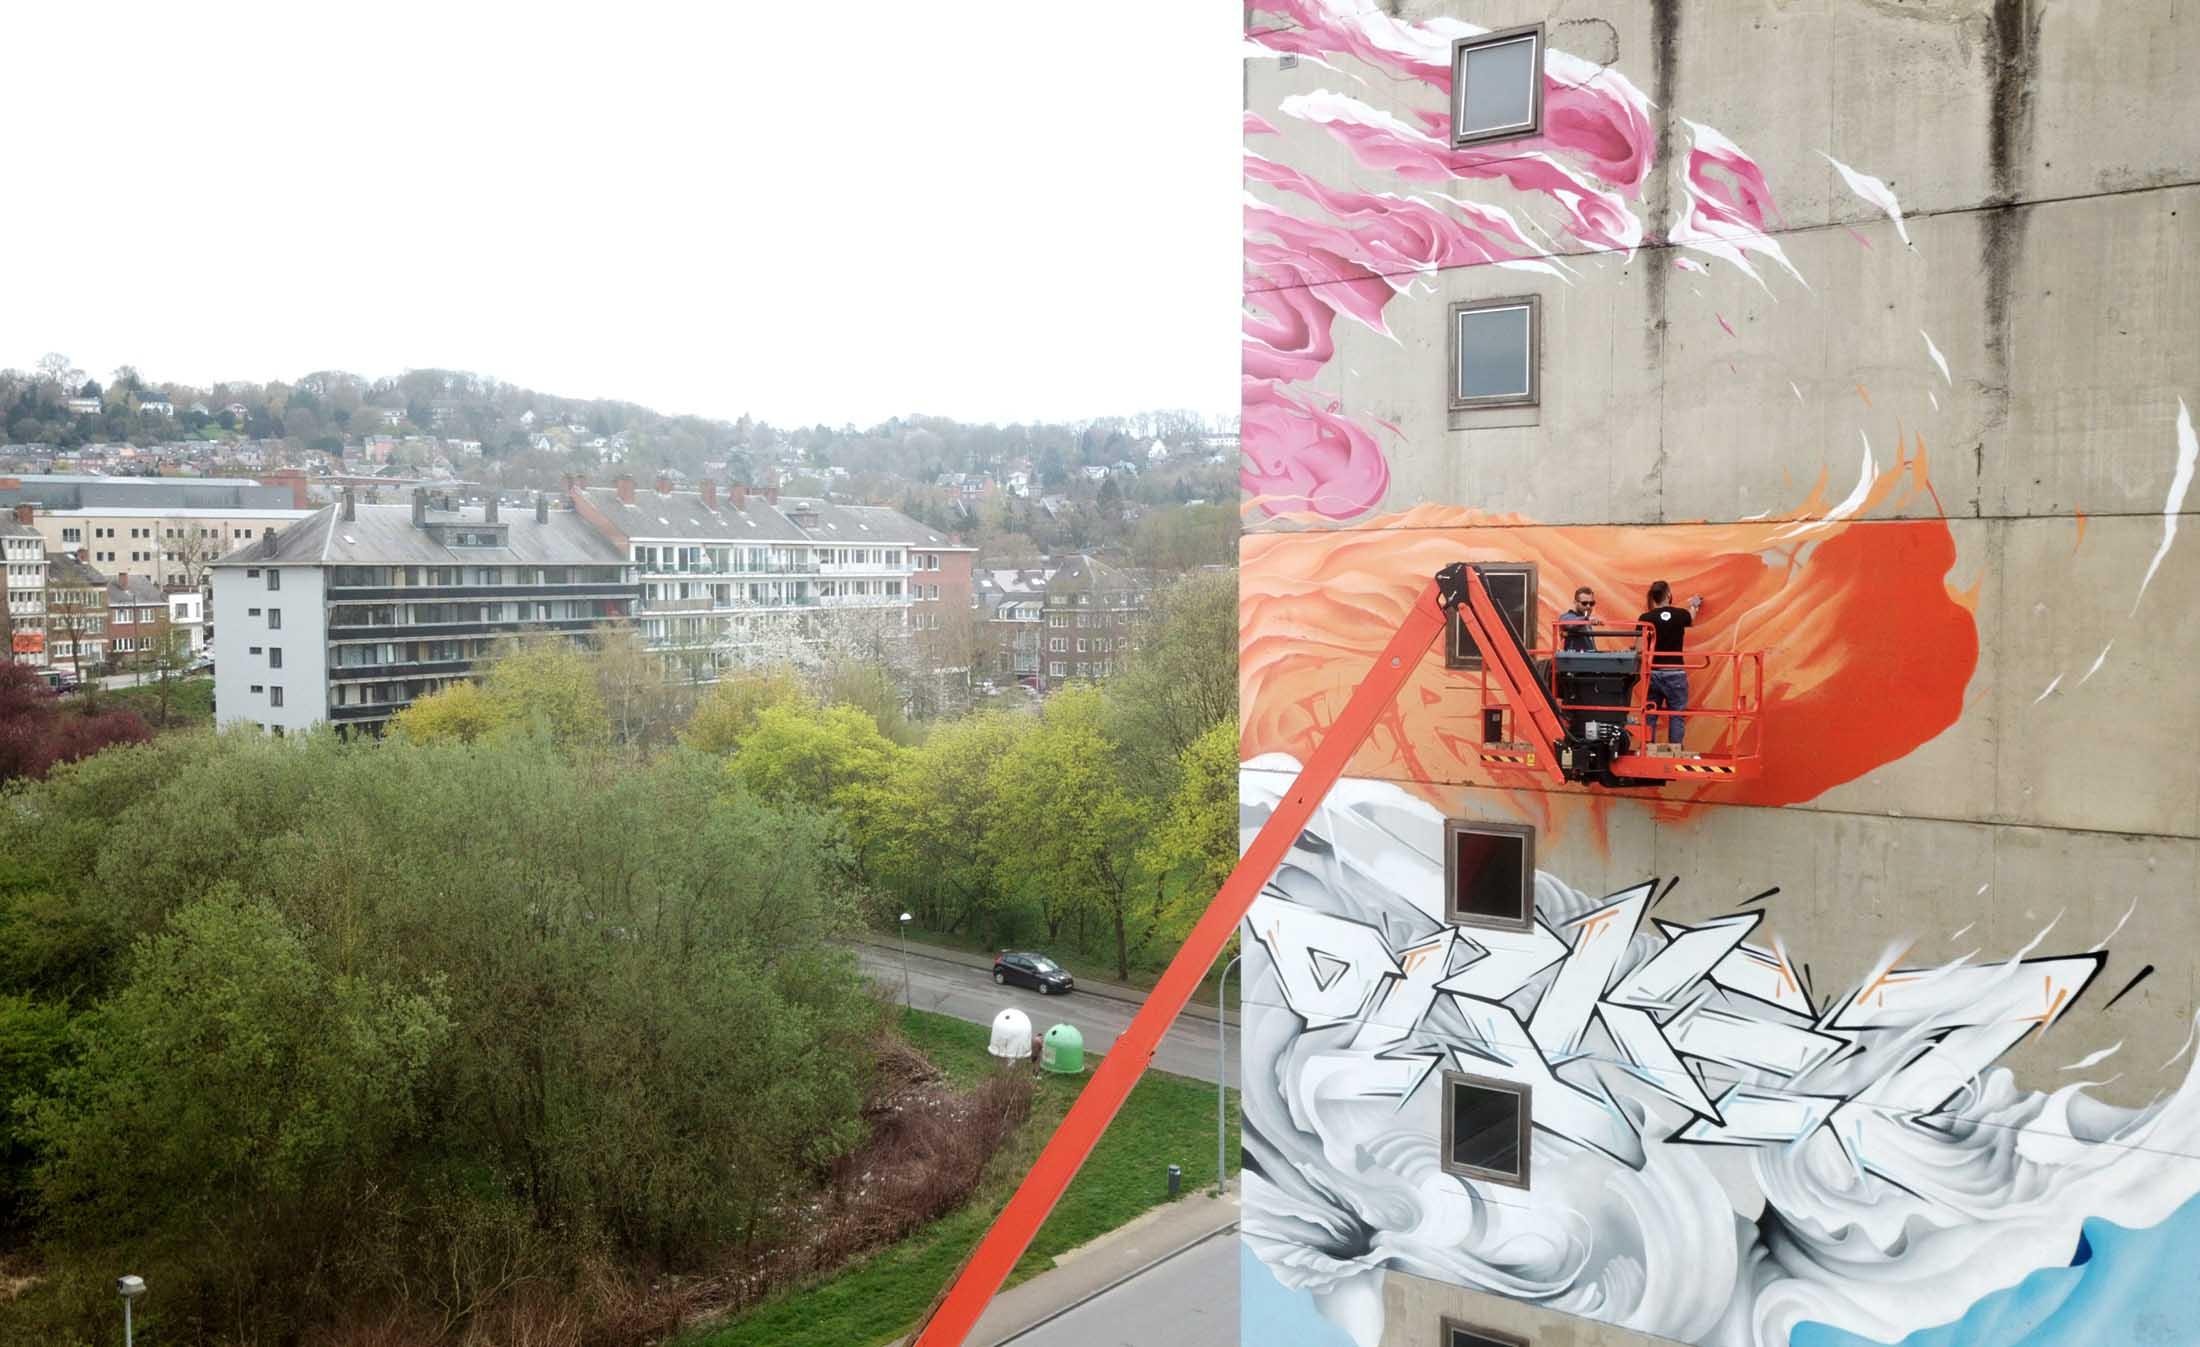 https://www.propaganza.be/wp-content/uploads/2016/05/propaganza-graffiti-street-art-belgium-belgique-roubens-orkez-trevor-namur-2018-2.jpg